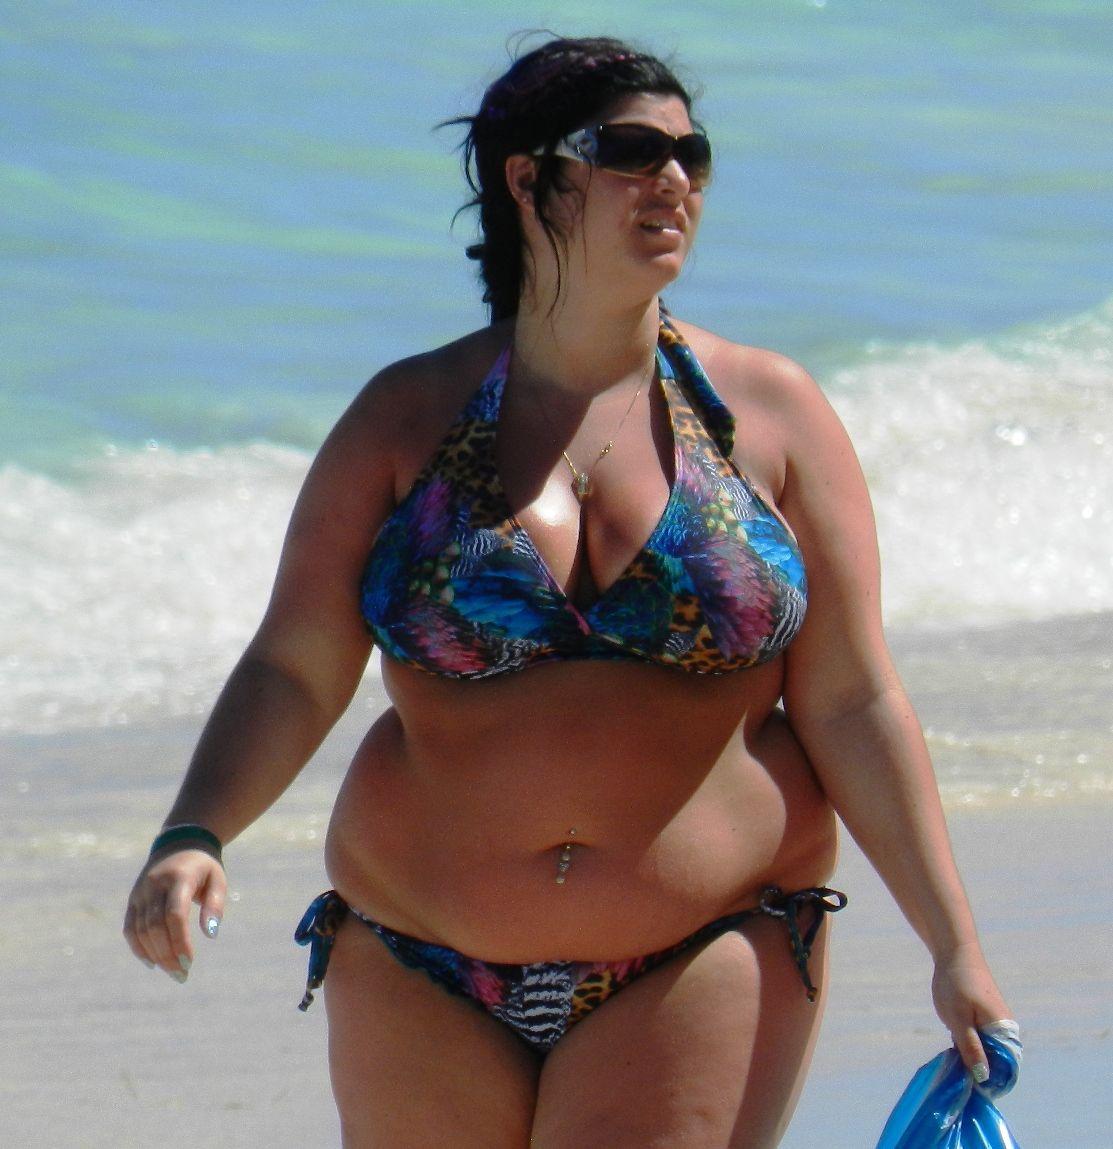 beach lifenatural beauty | bbw 2 | pinterest | beach, curves and